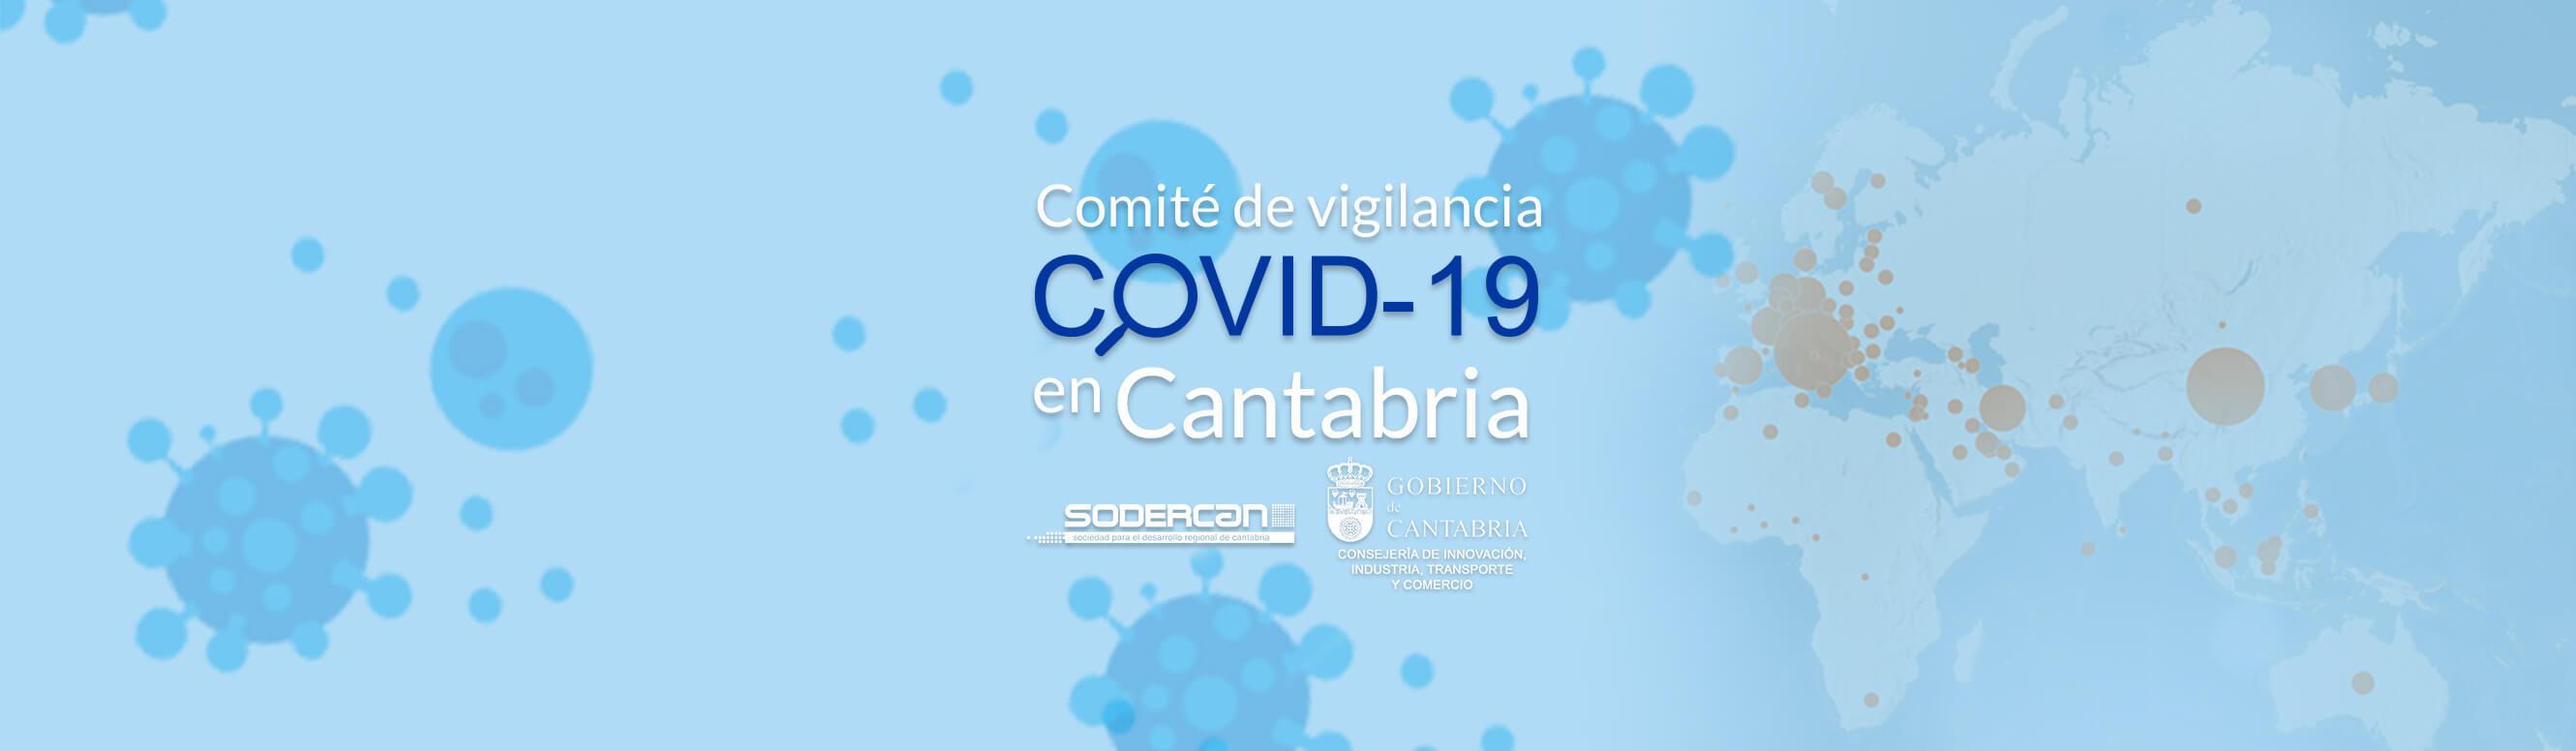 Comité de vigilancia COVID-19 en Cantabria